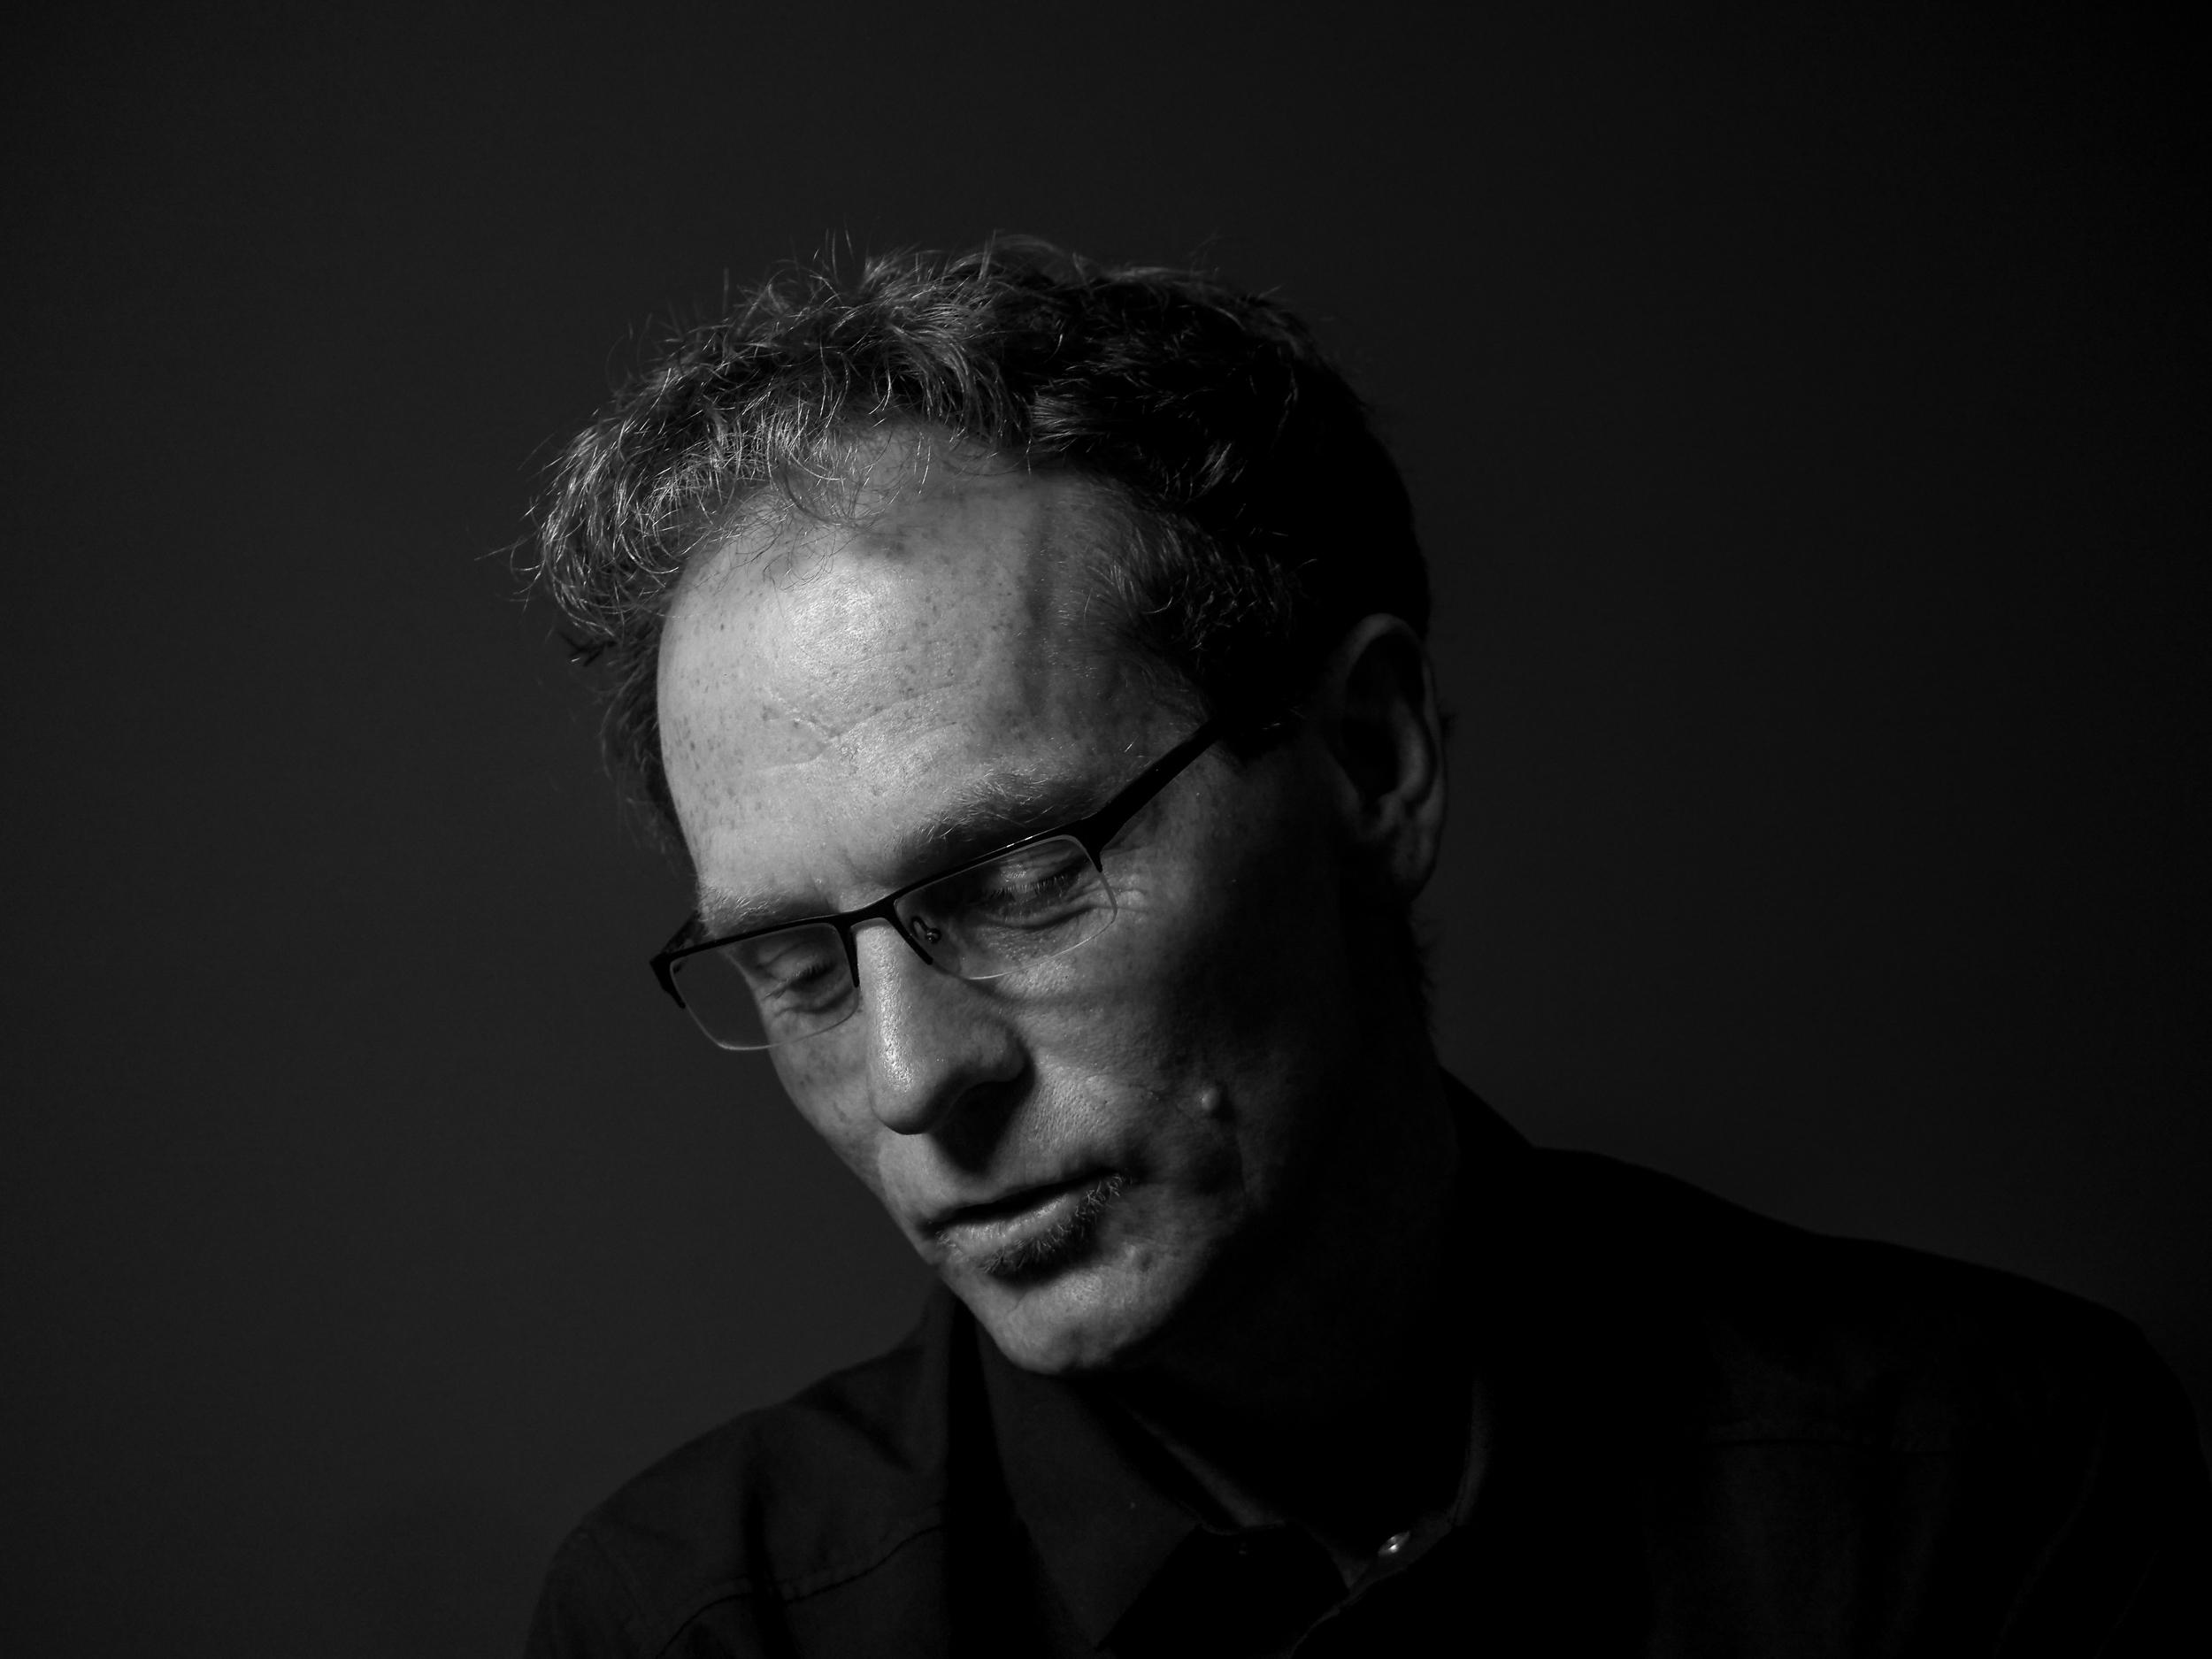 Skye Fitzgerald, Director